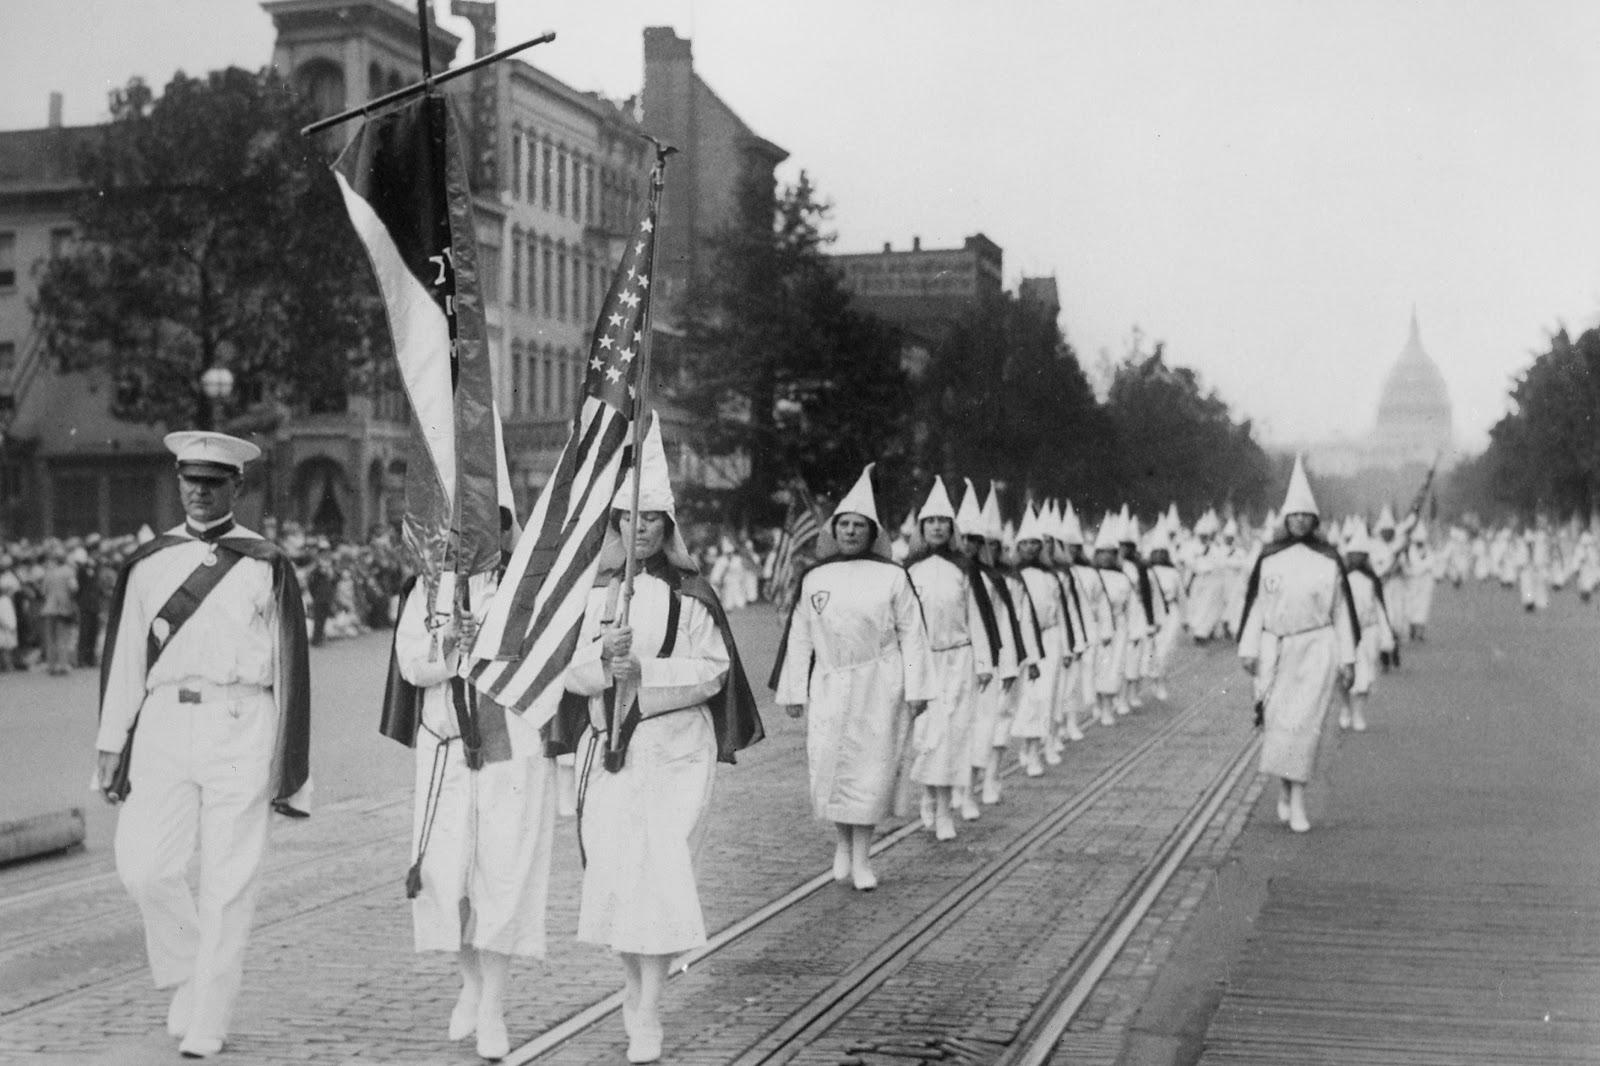 Ku Klux Klan, parade, Washington, DC